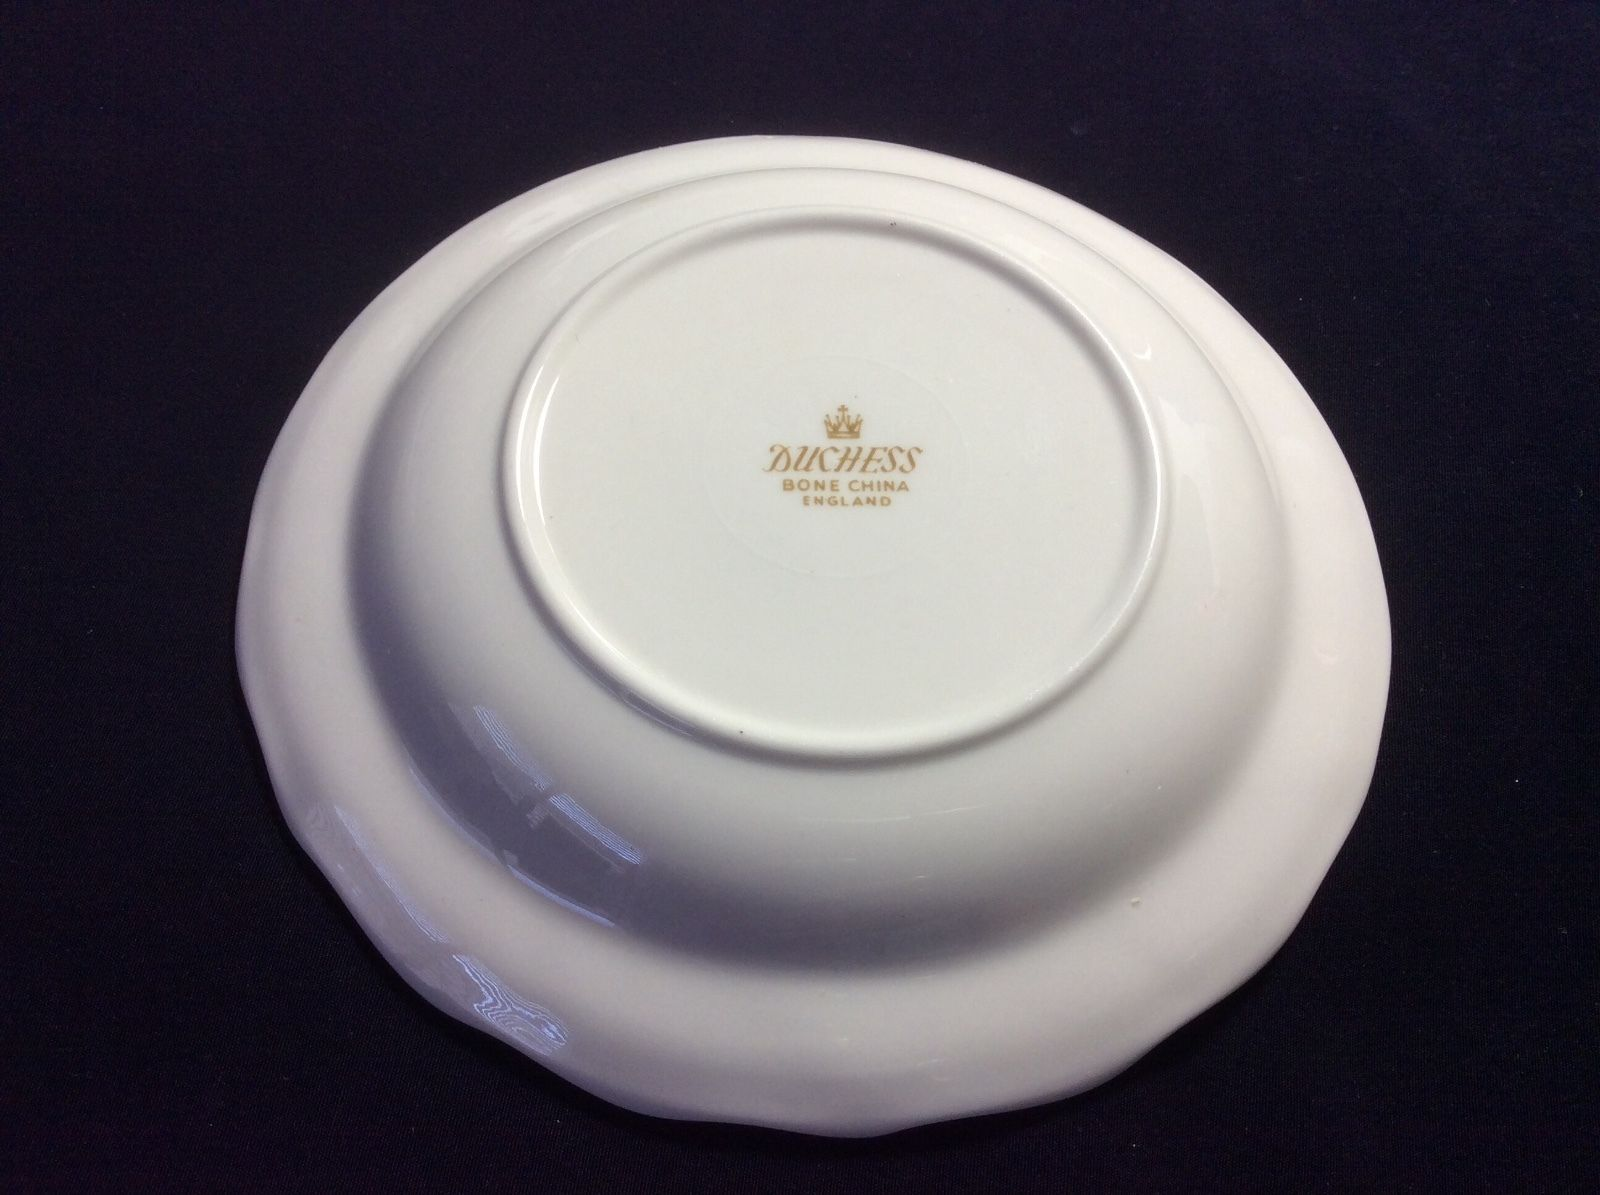 douchess bone china porcelain england british columbia 4. Black Bedroom Furniture Sets. Home Design Ideas